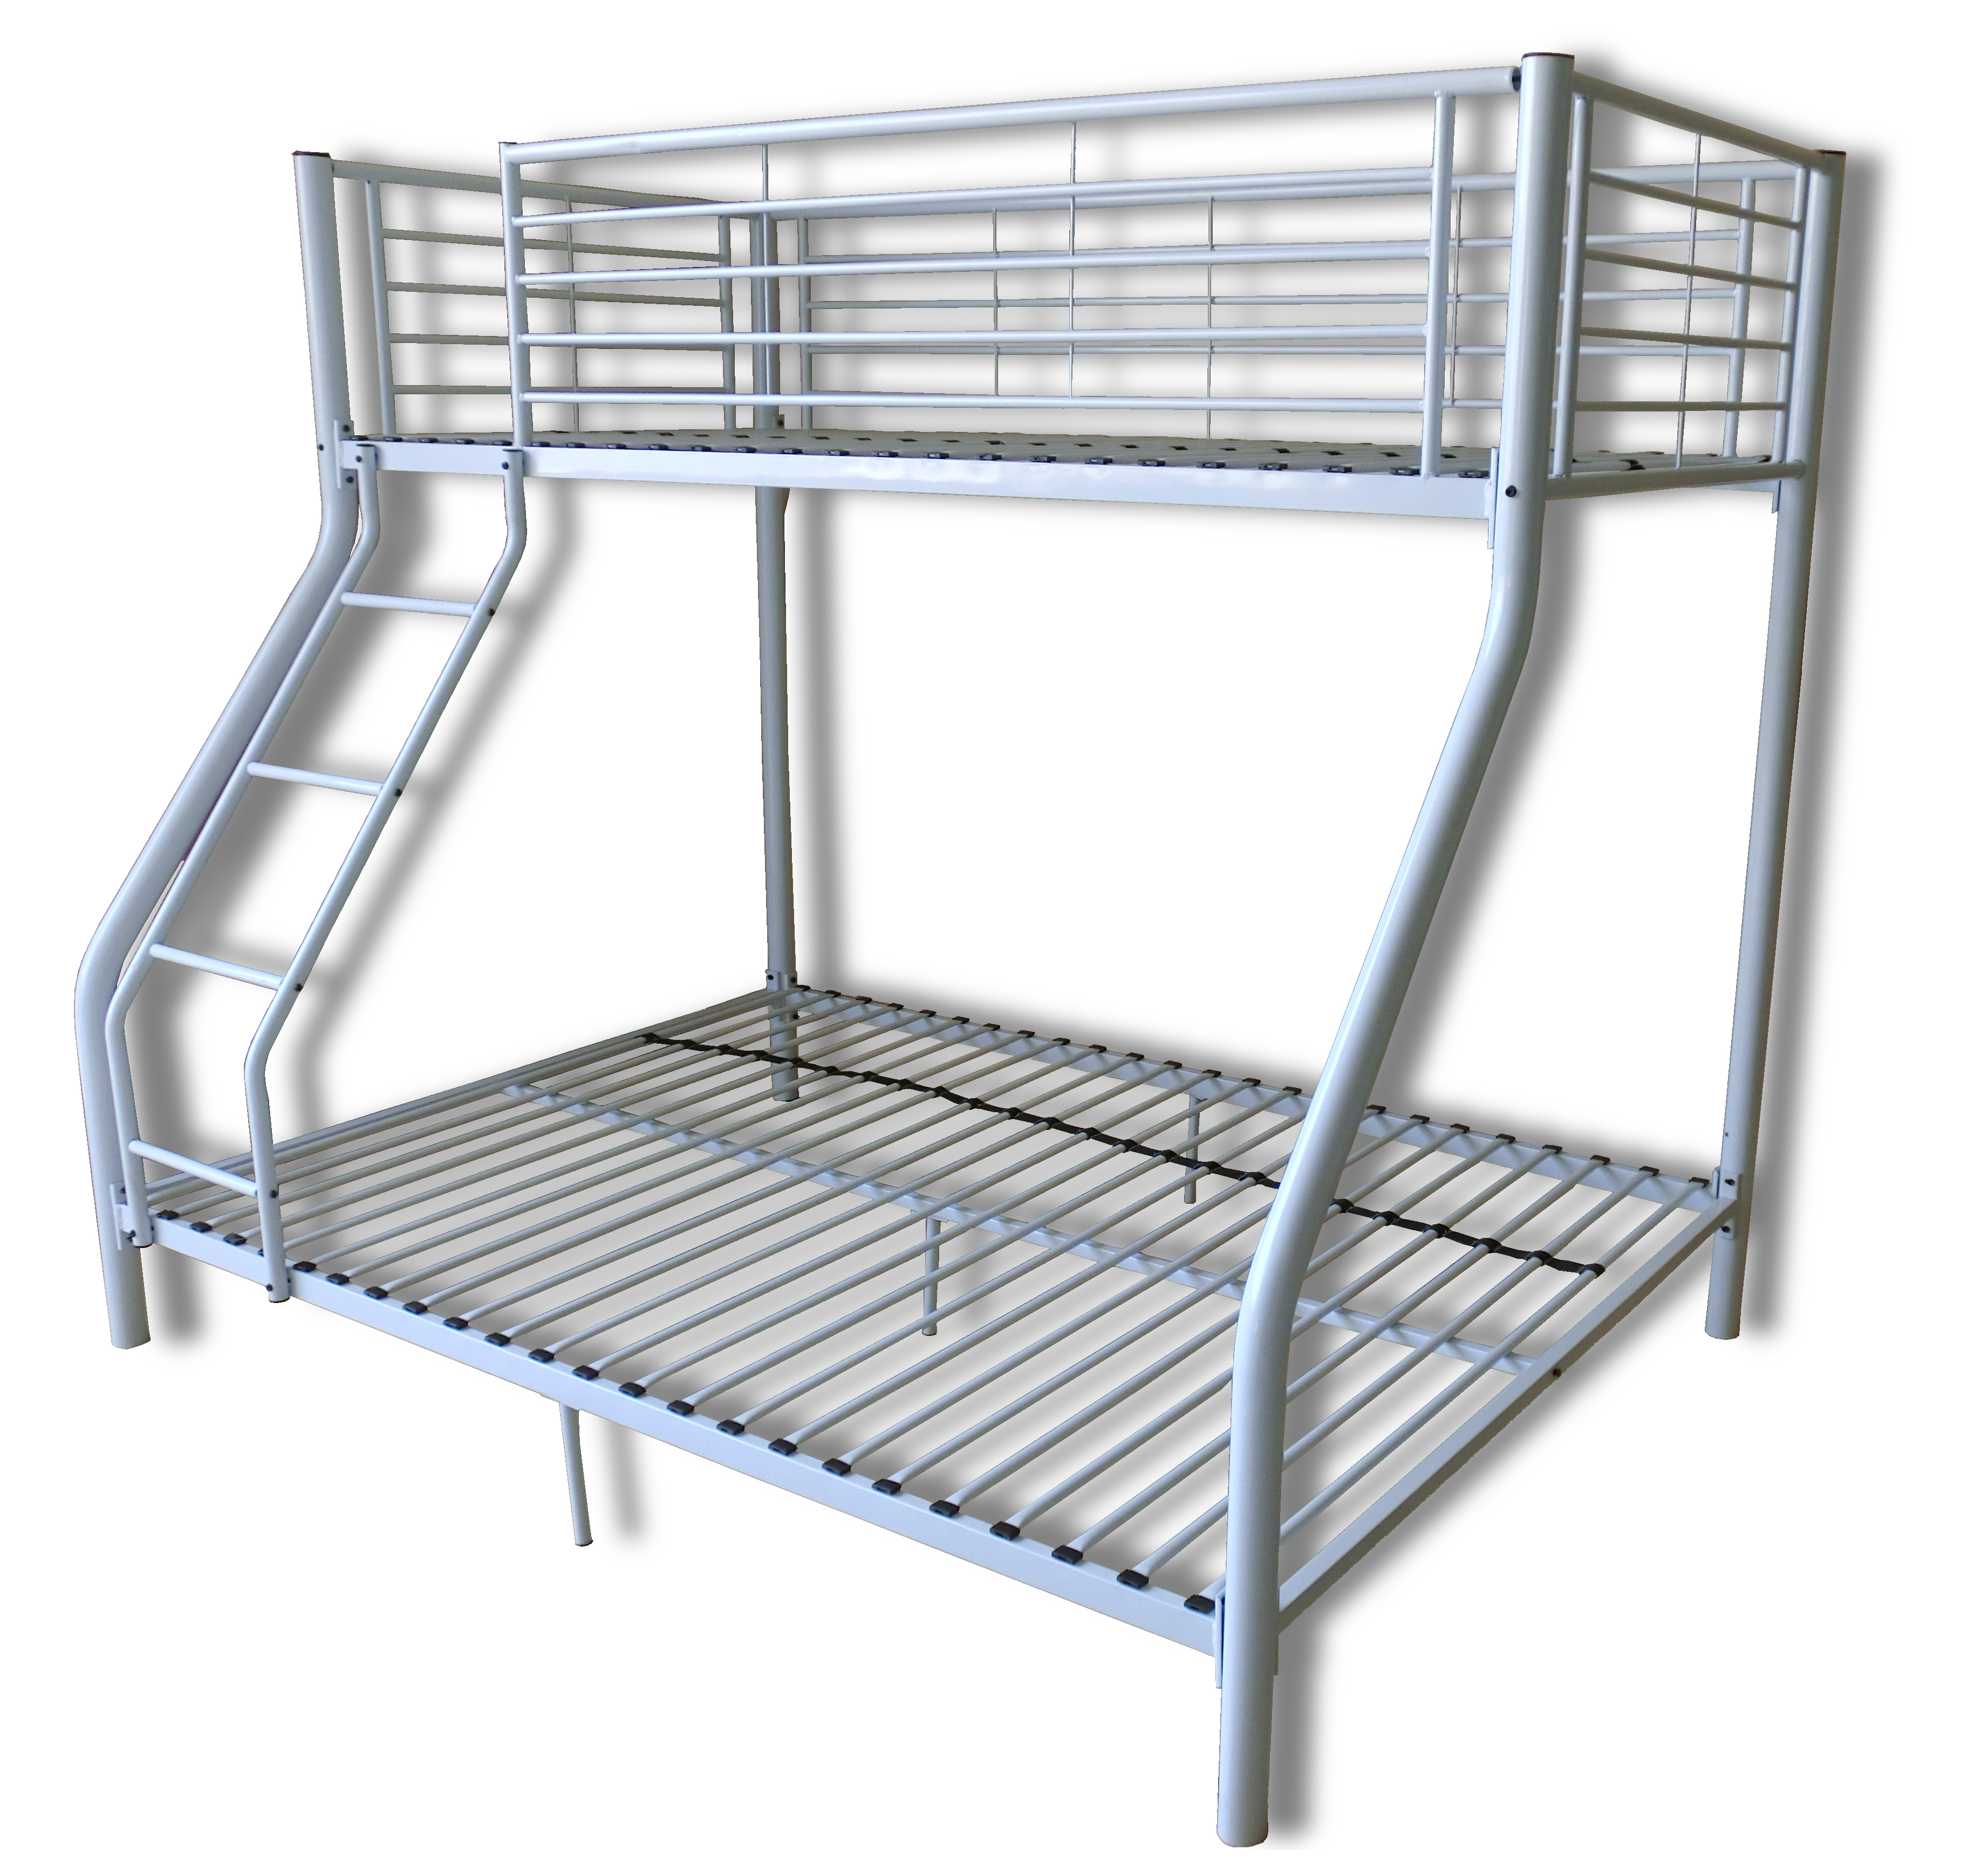 Steel double deck bed - Double Deck Bed Bedroom Steel Bed Frame Double Deck Bedding Sets